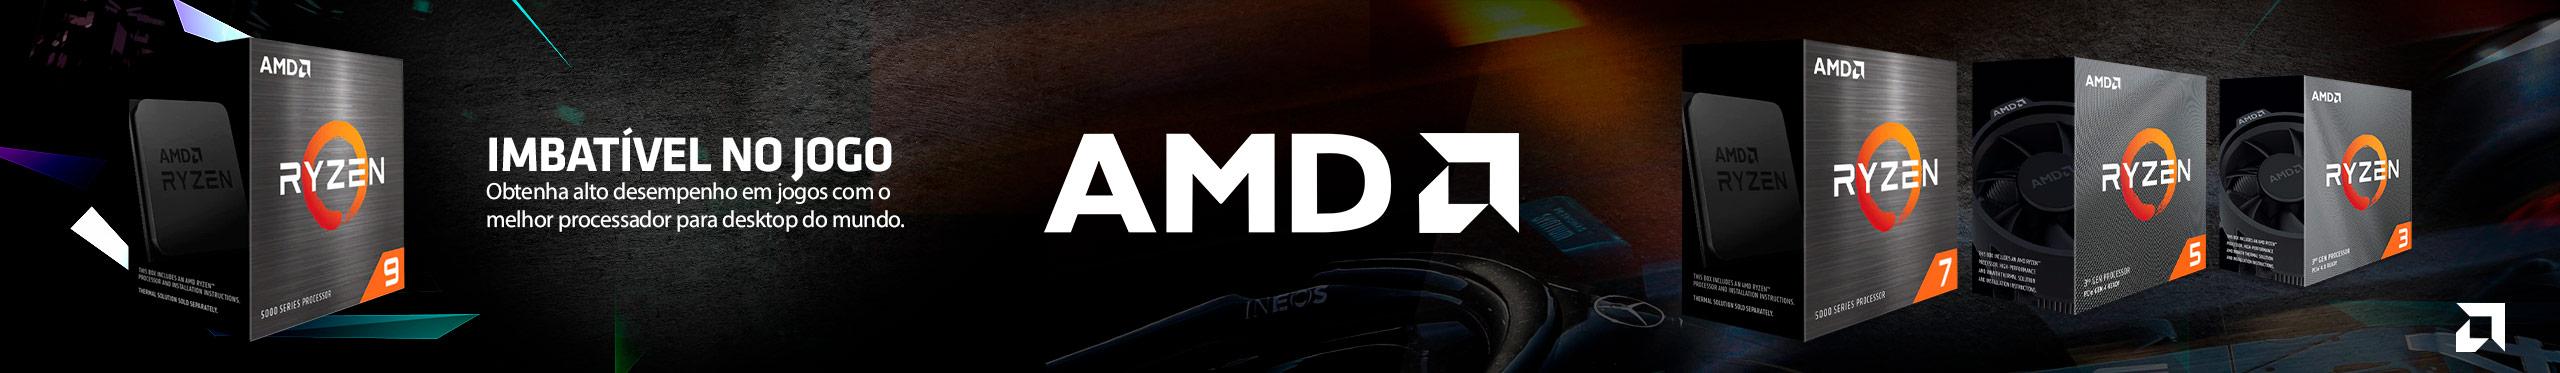 1º BANNER AMD